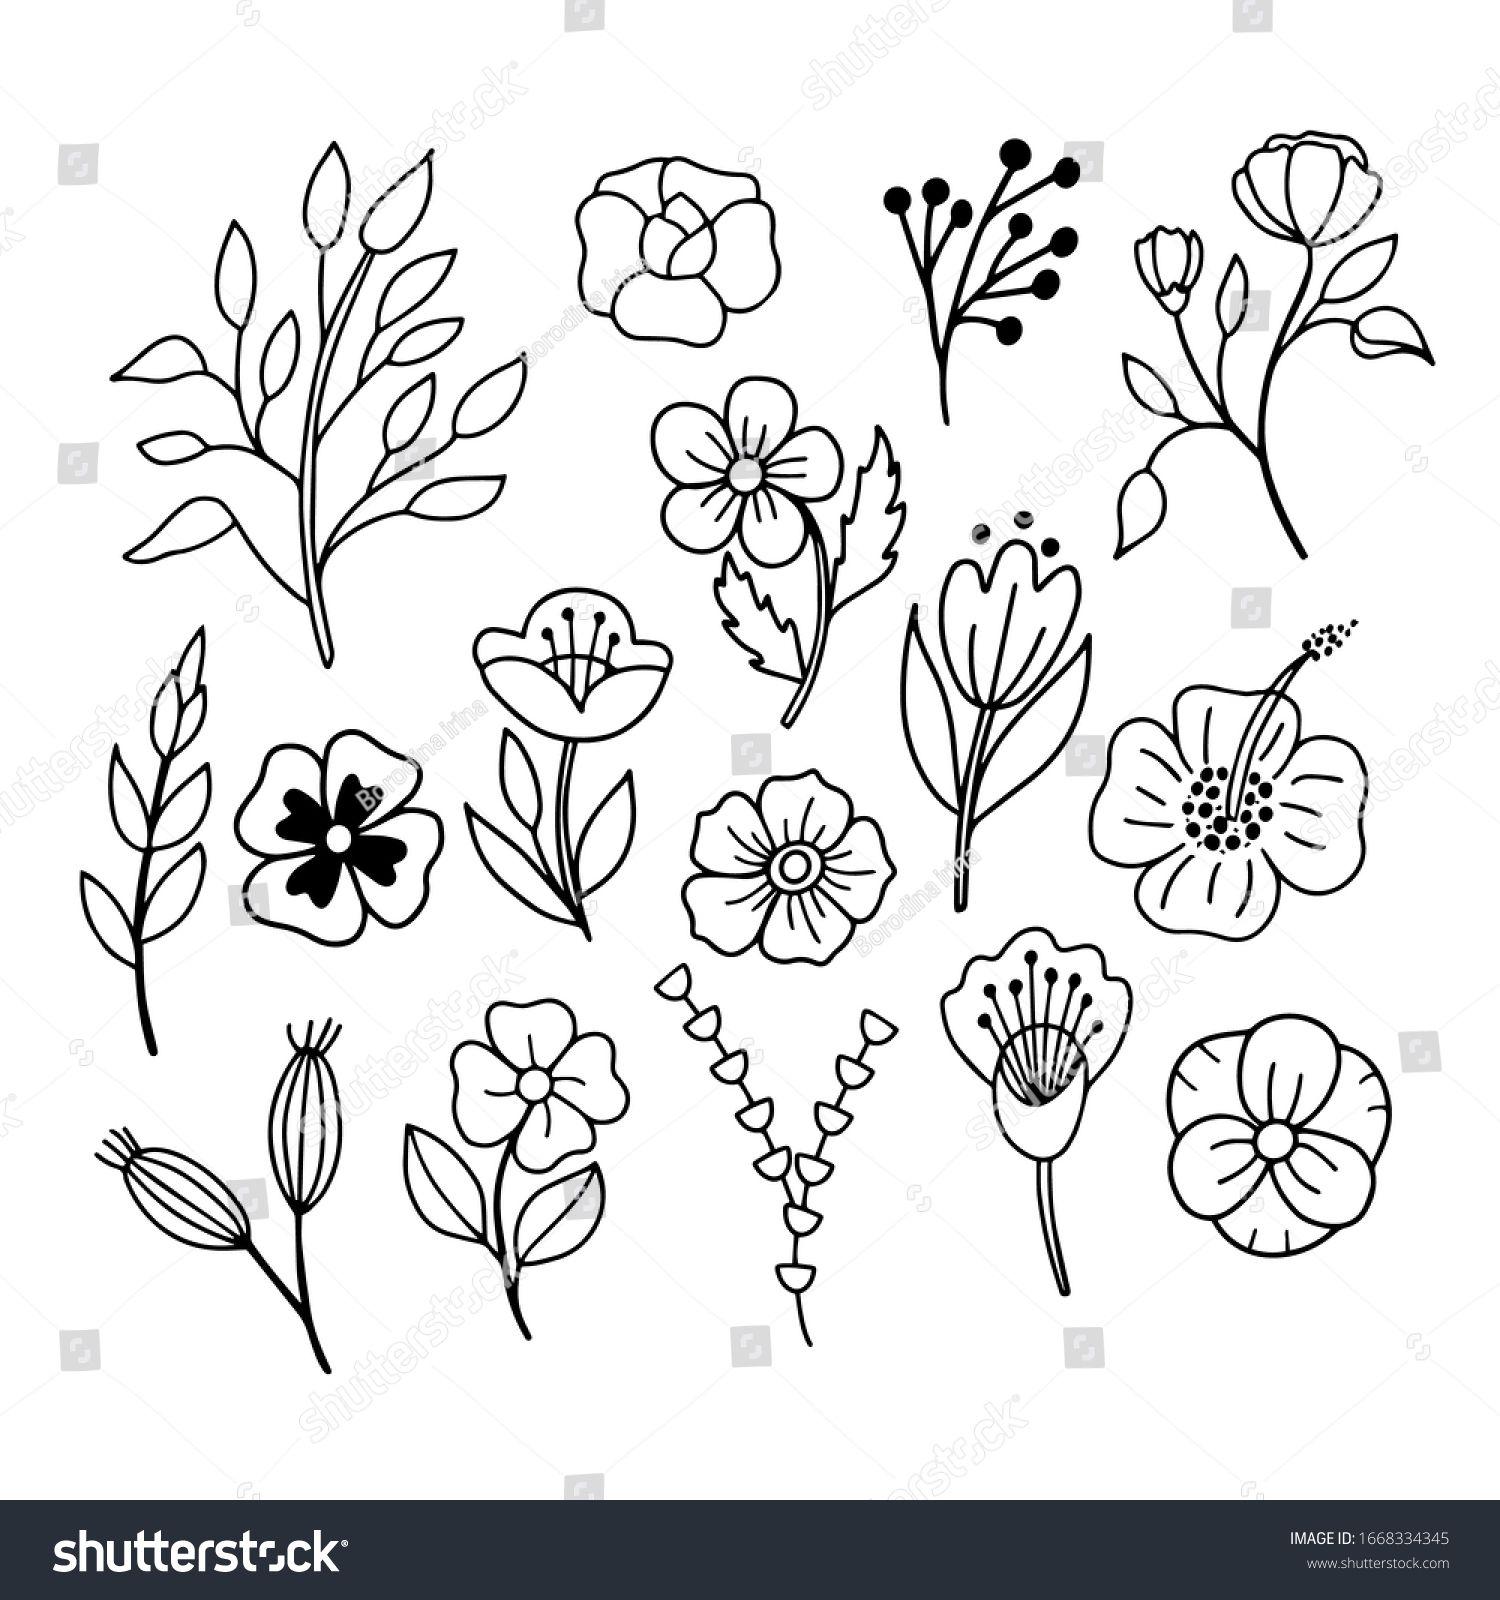 Vector Linear Image Leaves Flowers On Temaju Stockvektorkep Jogdijmentes 1668334345 In 2020 Flower Images Leaf Flowers White Flowers